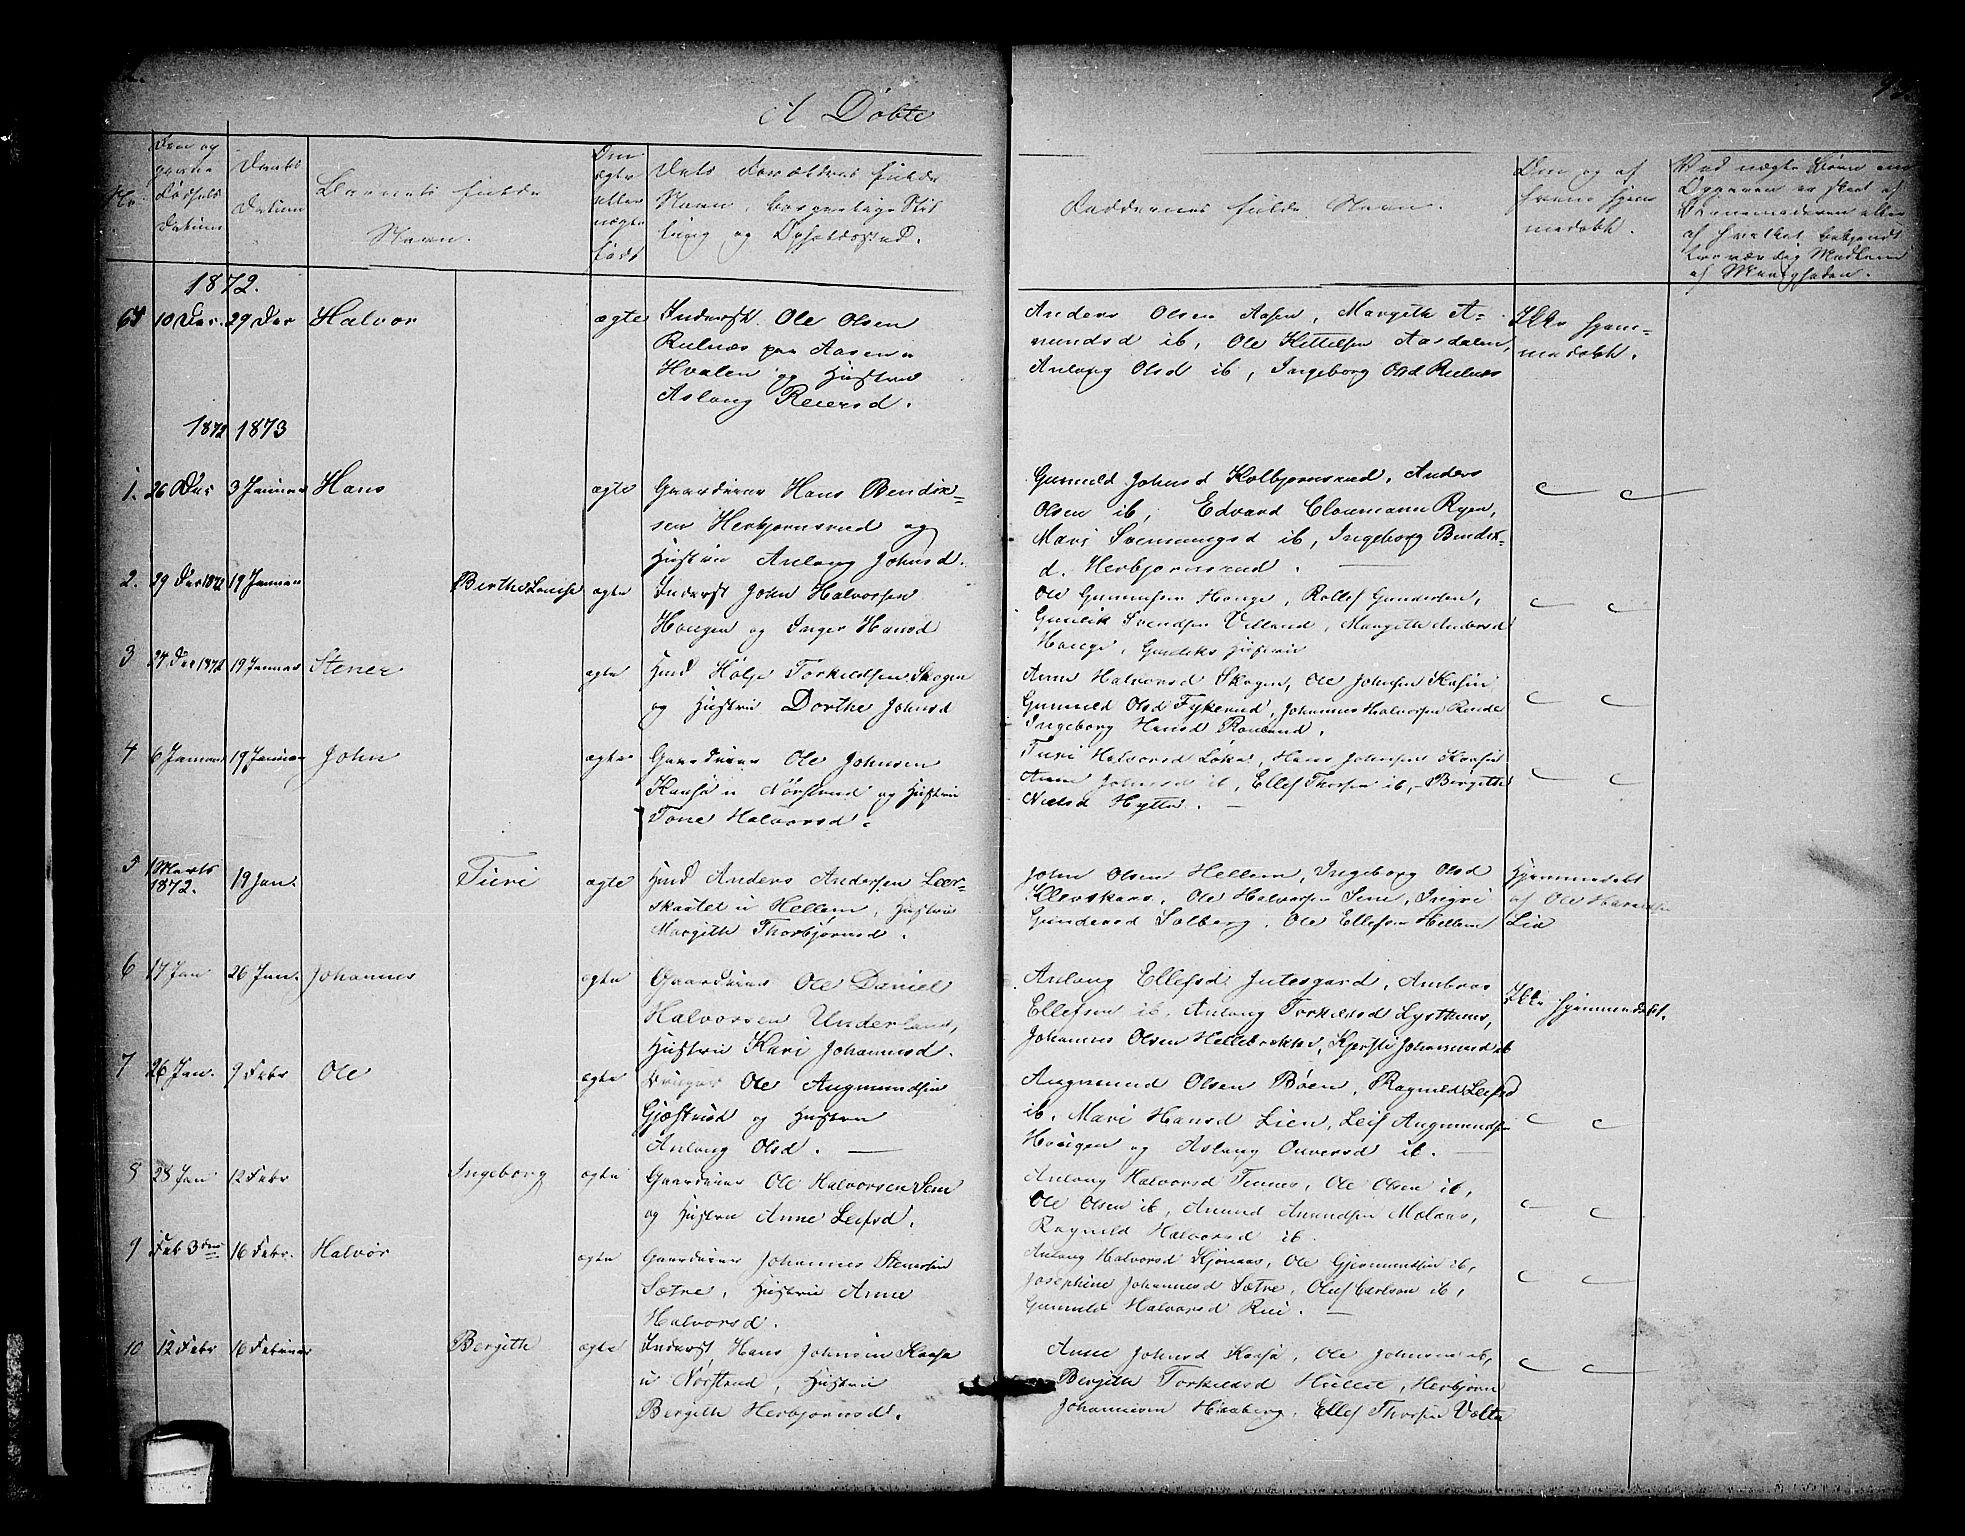 SAKO, Heddal kirkebøker, G/Ga/L0001: Klokkerbok nr. I 1, 1866-1878, s. 92-93